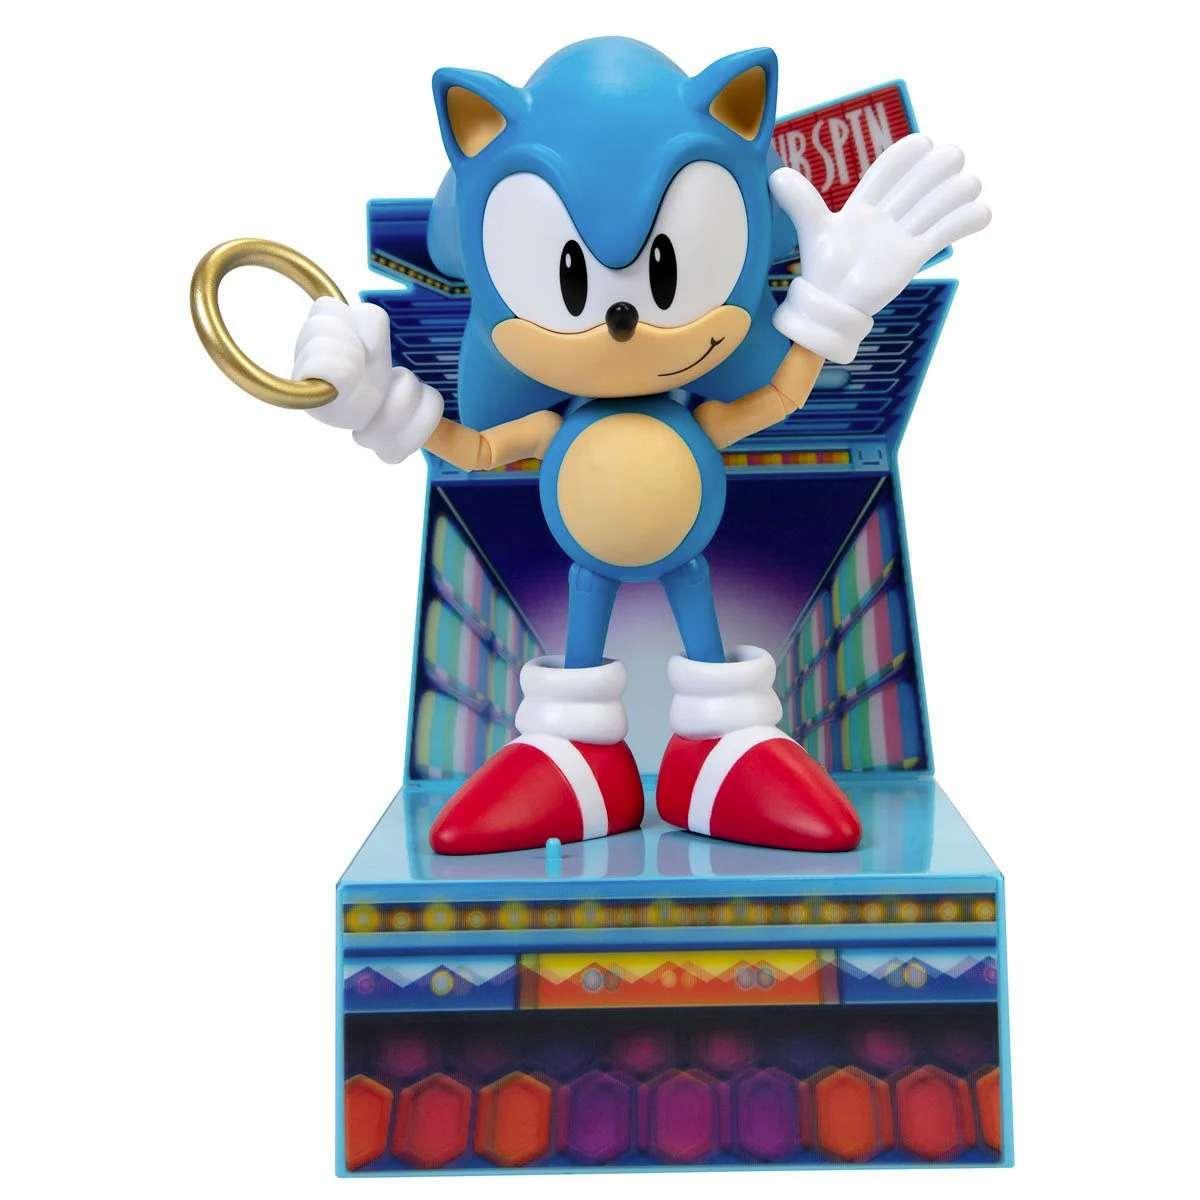 sonic-the-hedgehog-action-figure-jakks